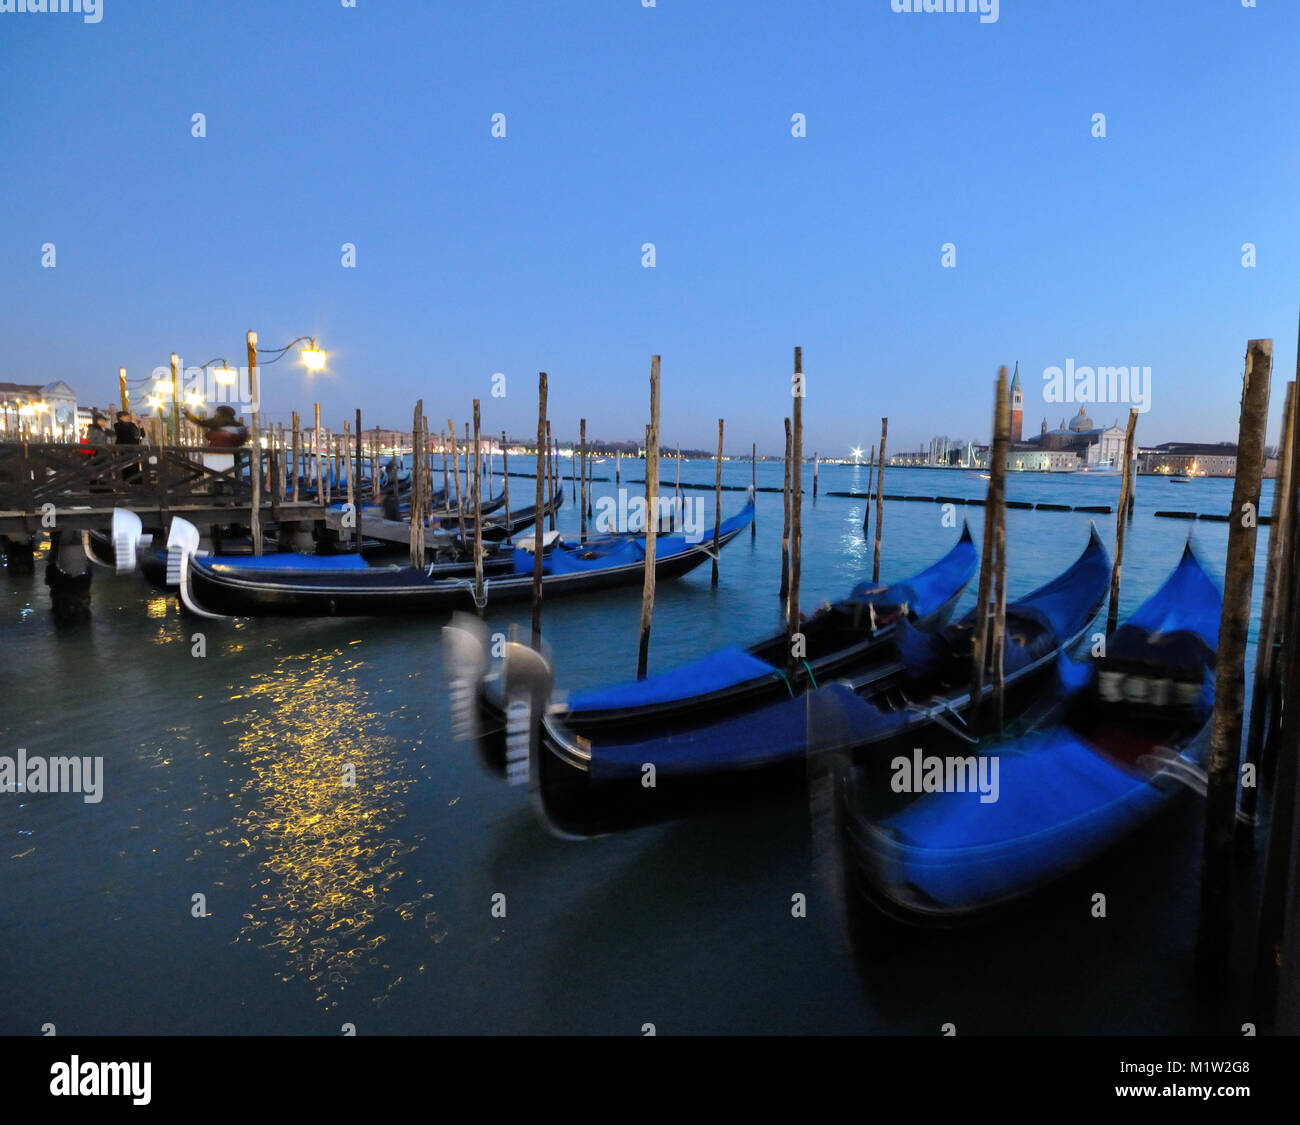 Gondolas in the Bacino di San Marco, Venice, Italy - Stock Image